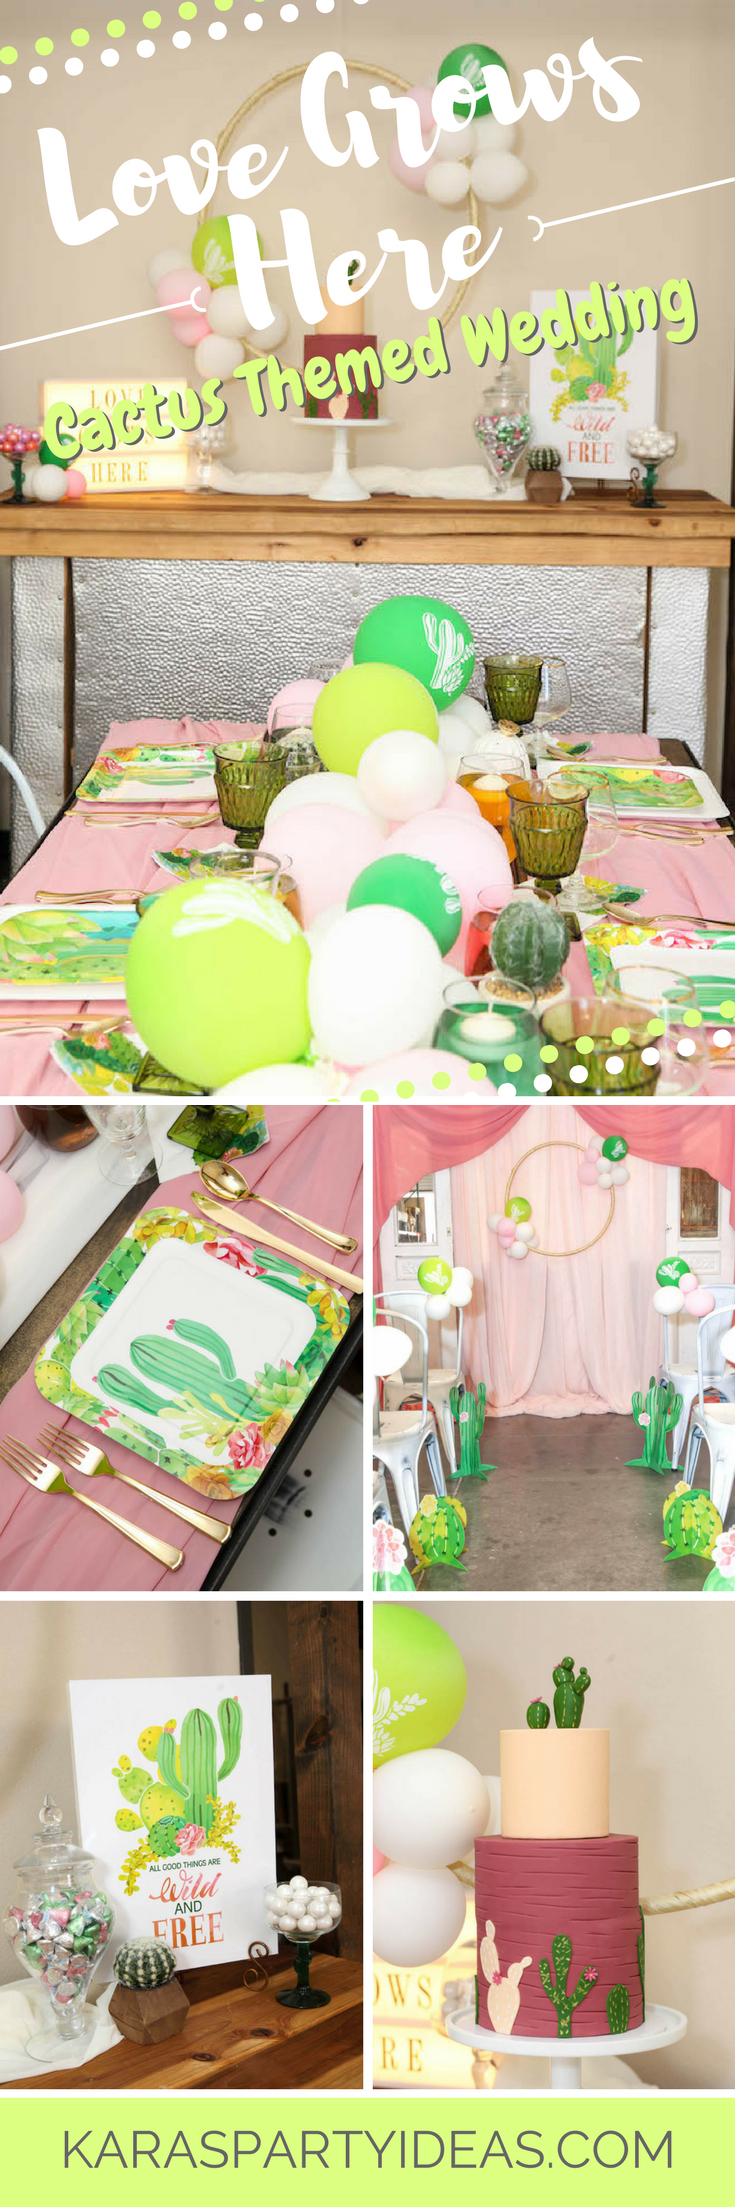 Love Grows Here Cactus Themed Wedding via Kara's Party Ideas - KarasPartyIdeas.com